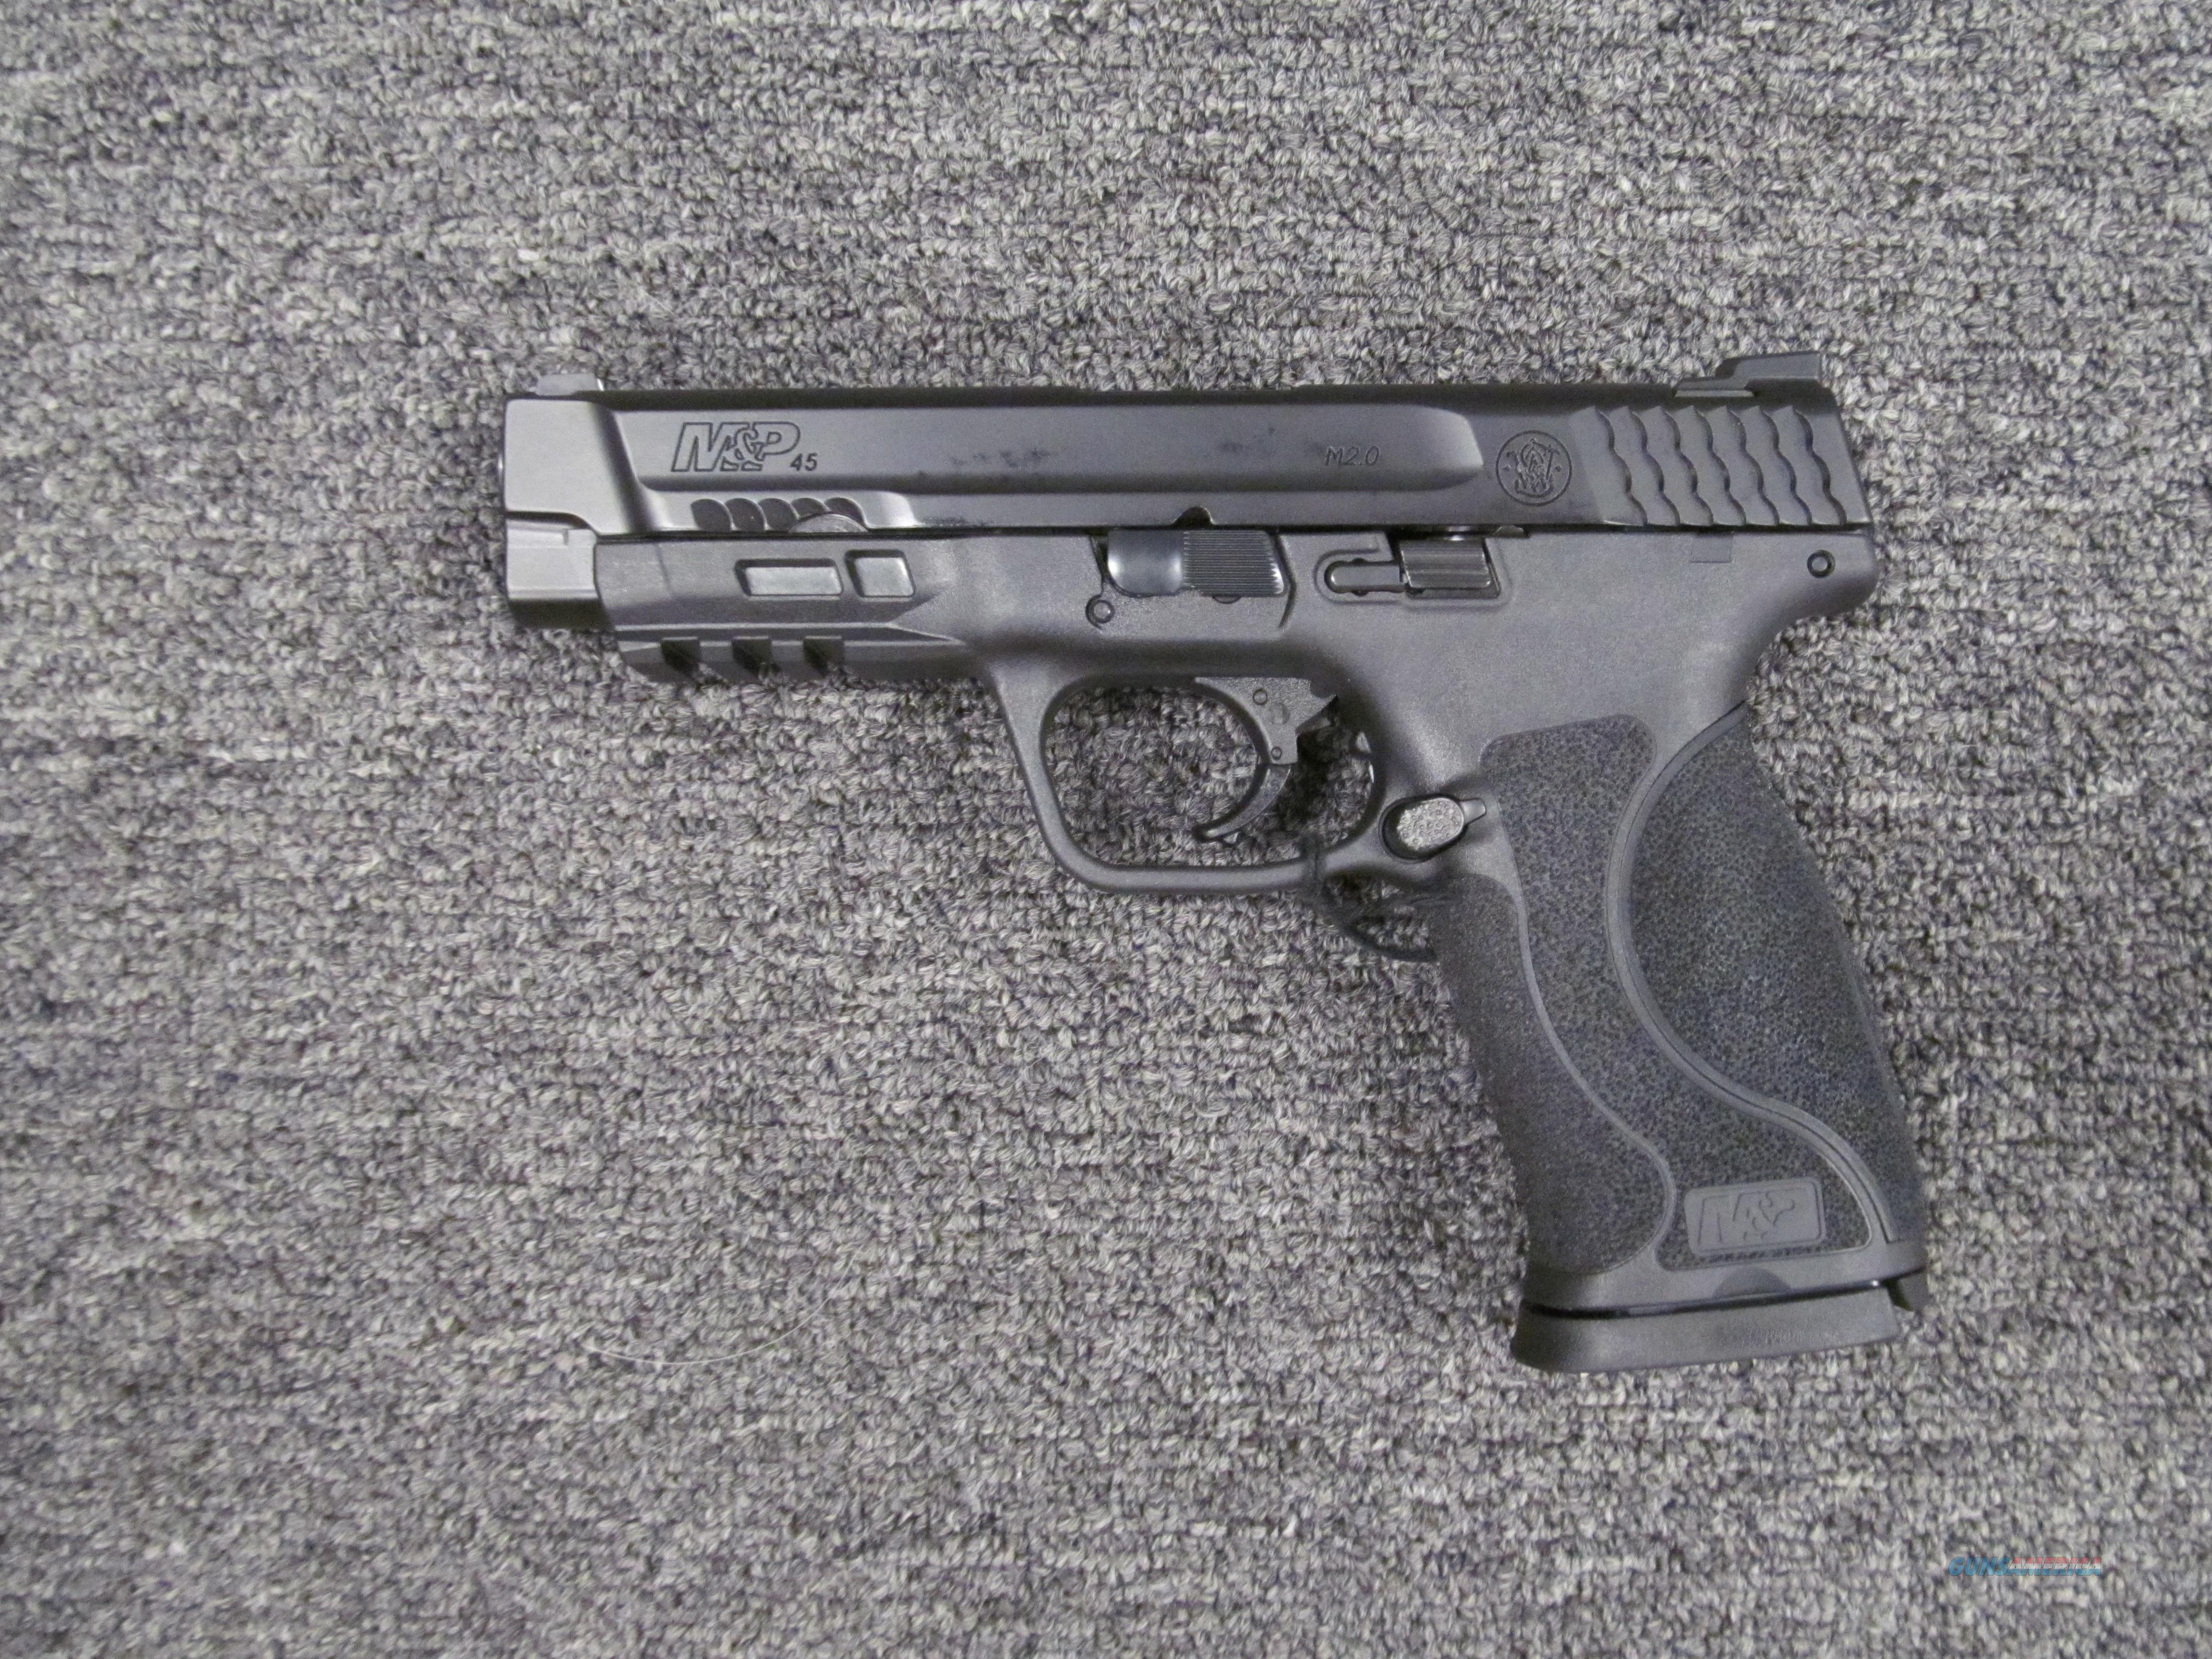 Smith&Wesson M&P 45 M2.0  Guns > Pistols > Smith & Wesson Pistols - Autos > Alloy Frame